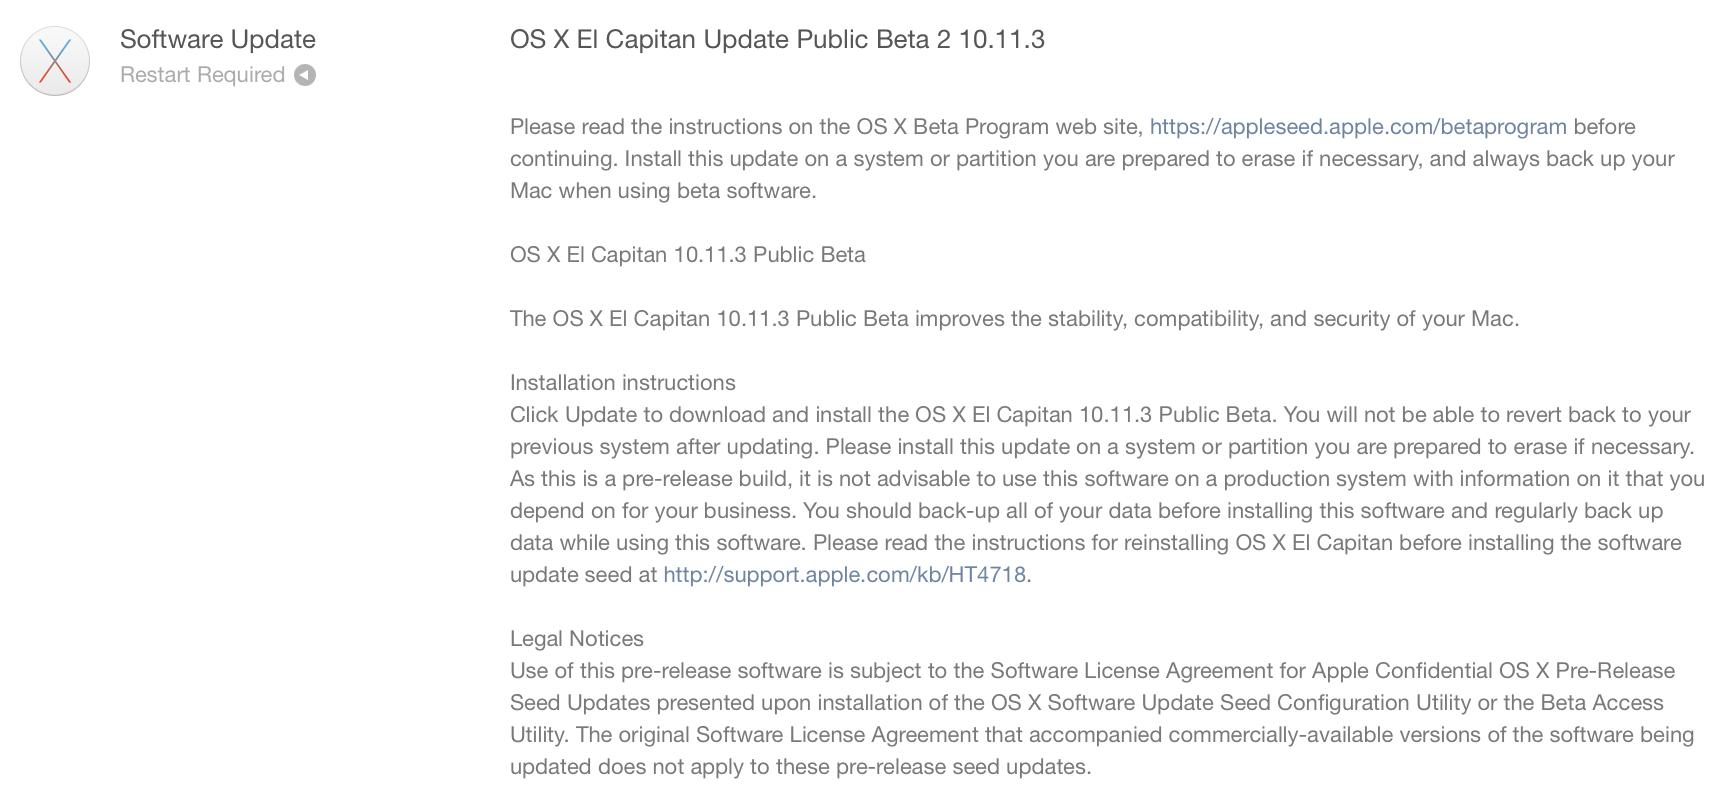 OS X El Capitan 10.11.3 beta 2 업데이트 개발자와 퍼블릭 베타 테스터에 공개.